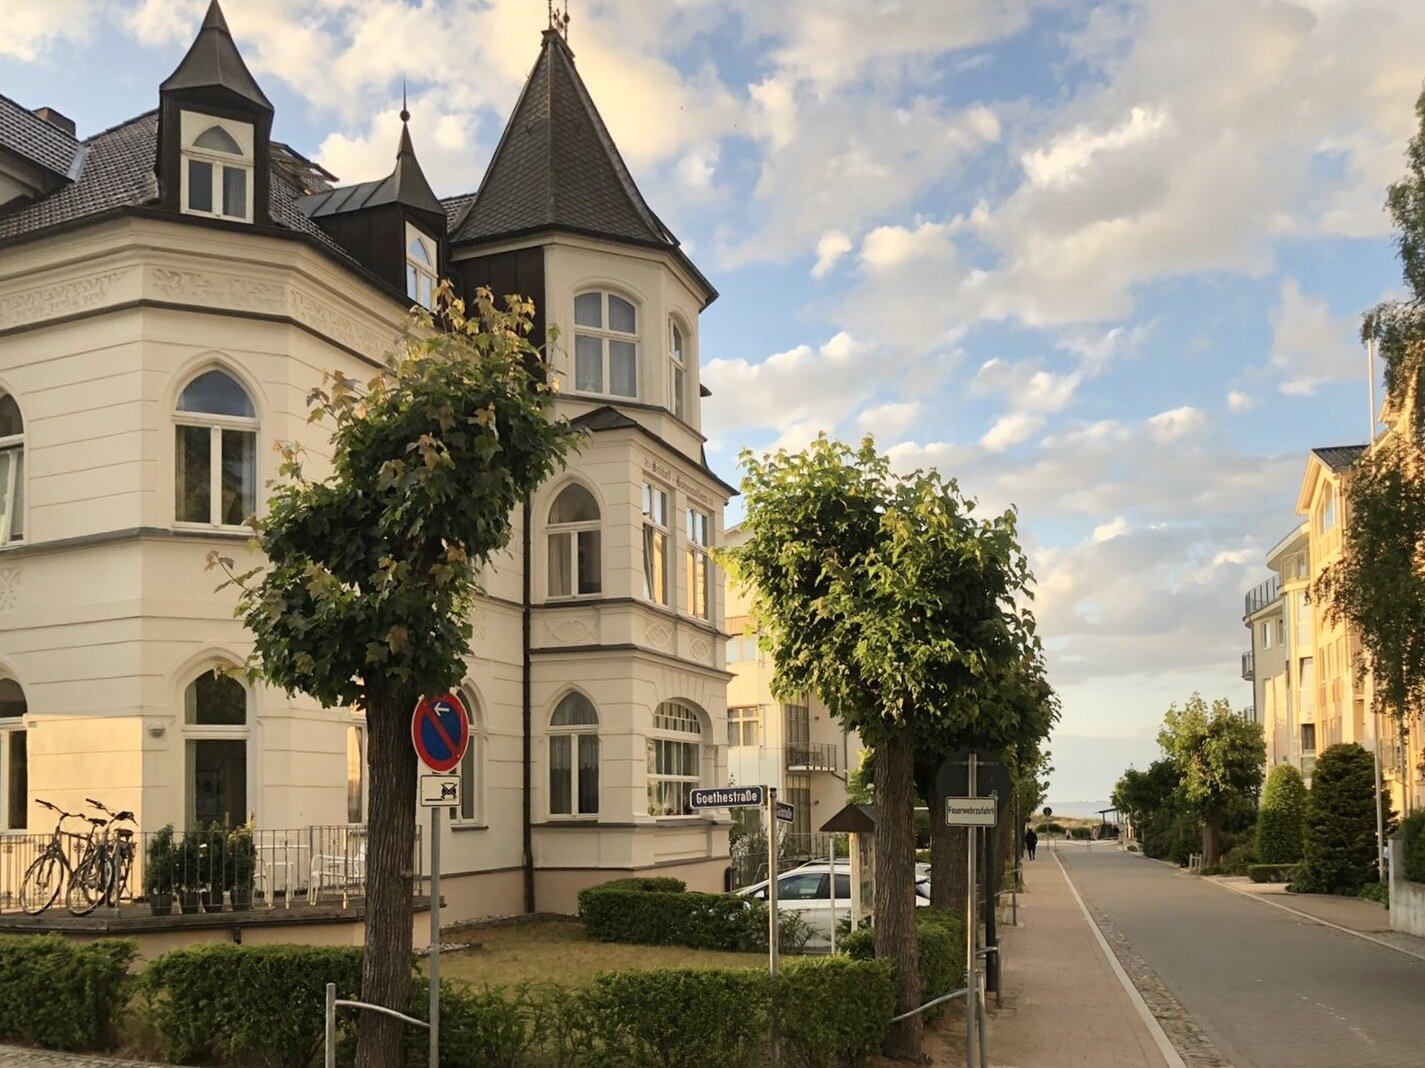 Schloss Hohenzollern - Ingas Ahlbeck